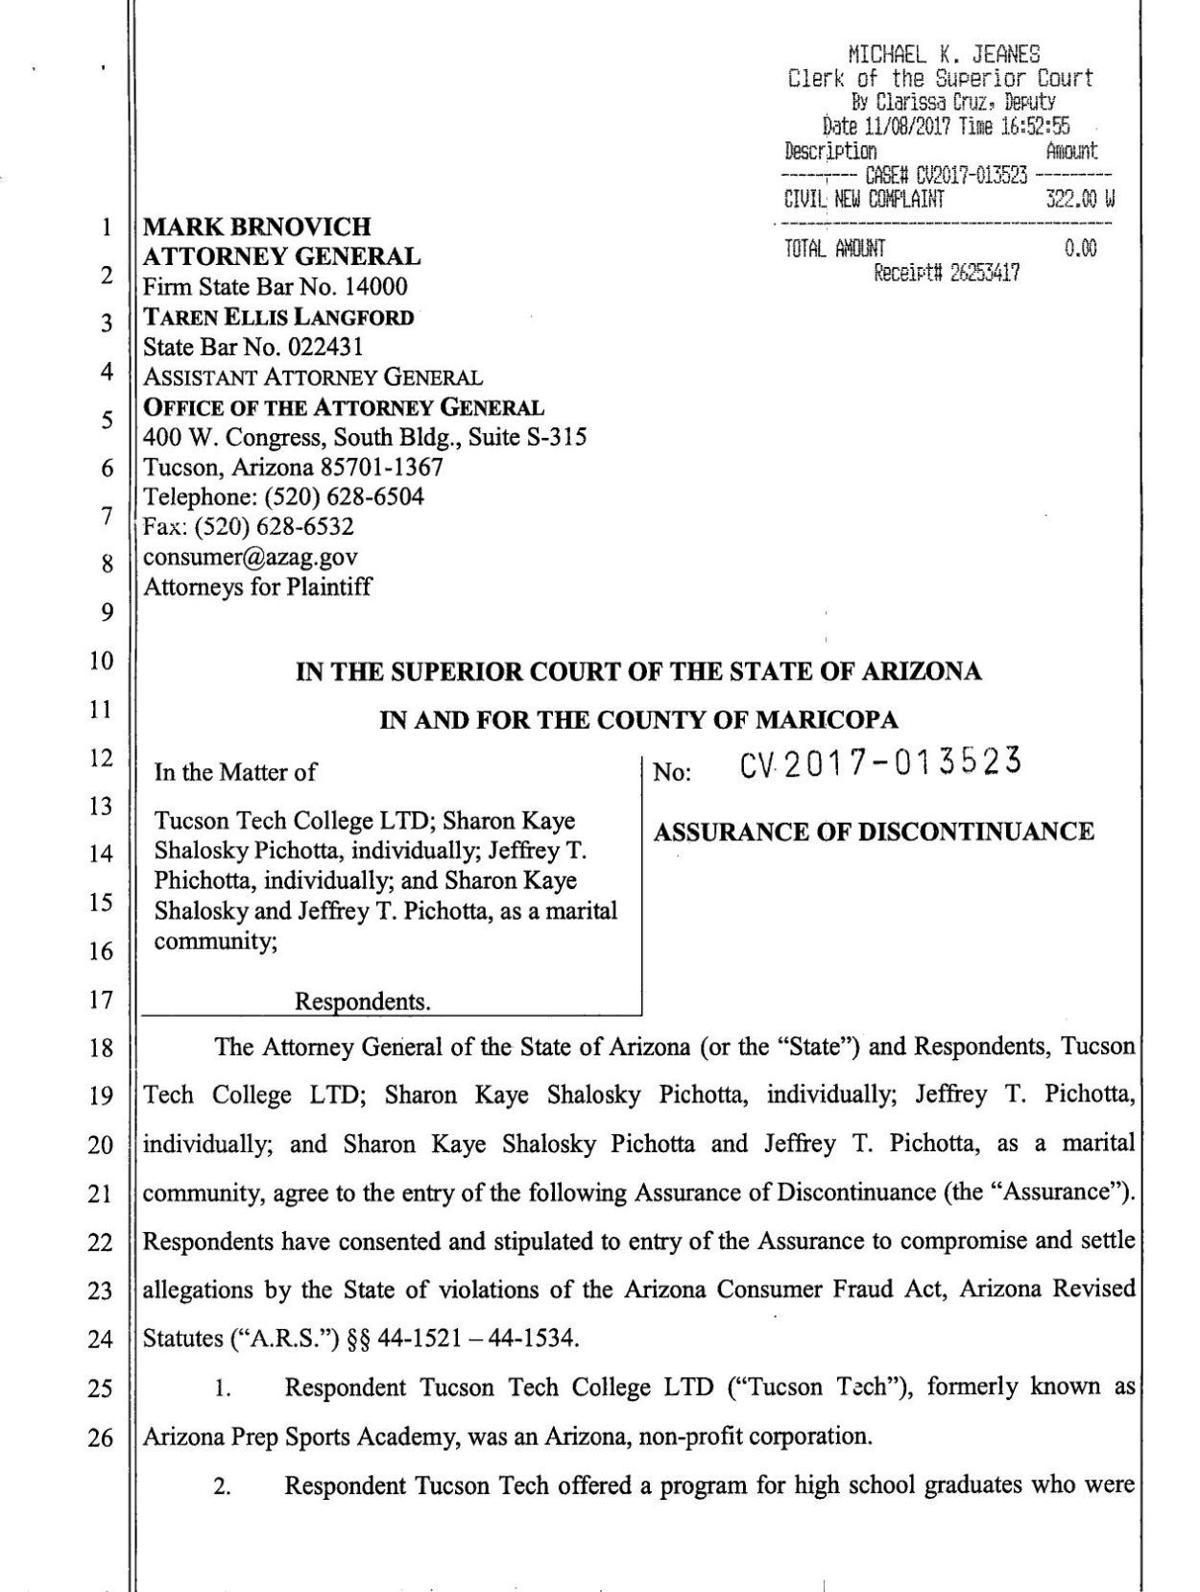 Settlement Agreement Tucson Tech Tucson